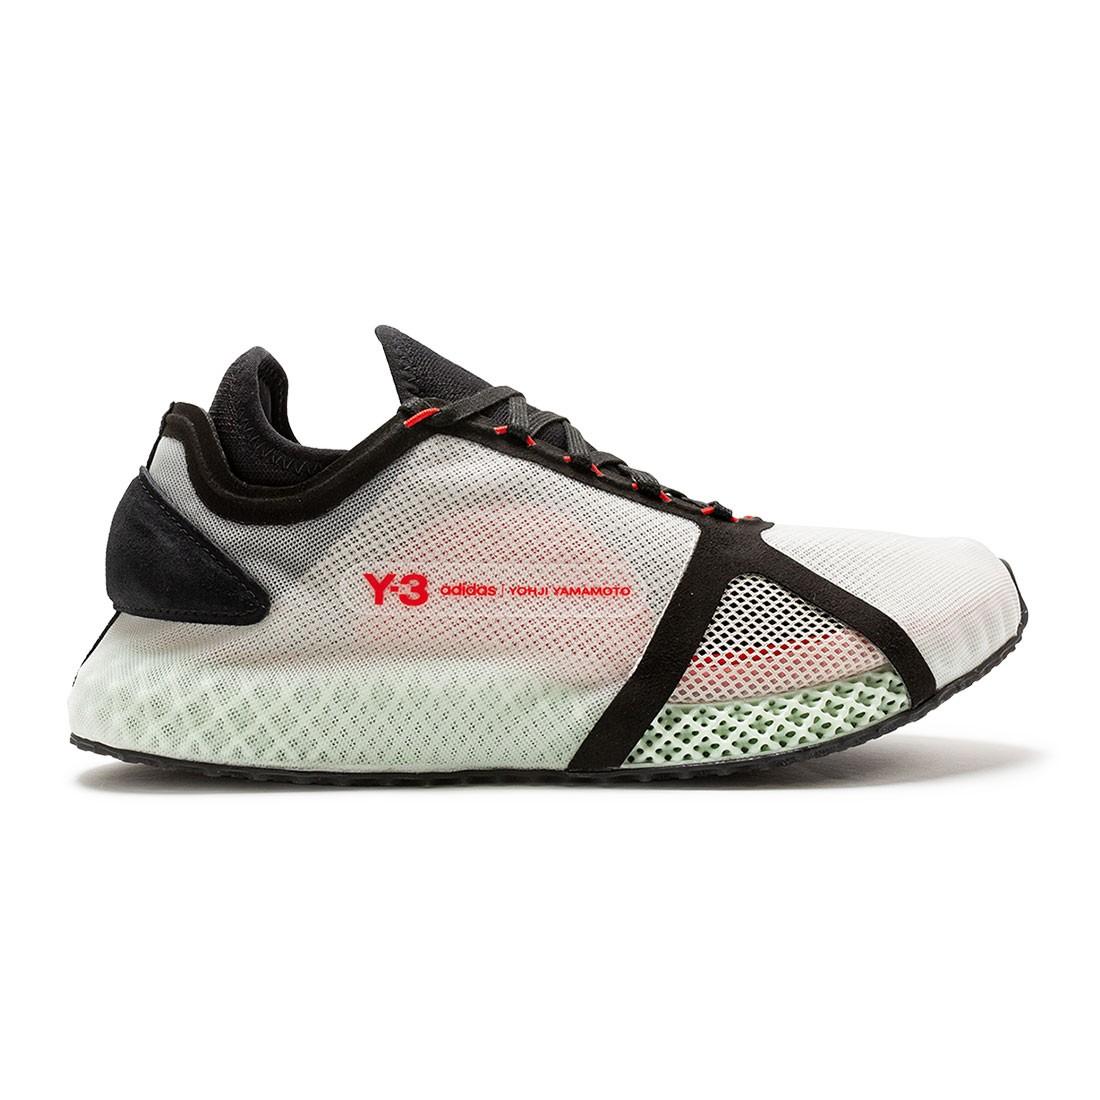 Adidas Y-3 Men Runner 4D IOW (beige / clear brown / black / red)